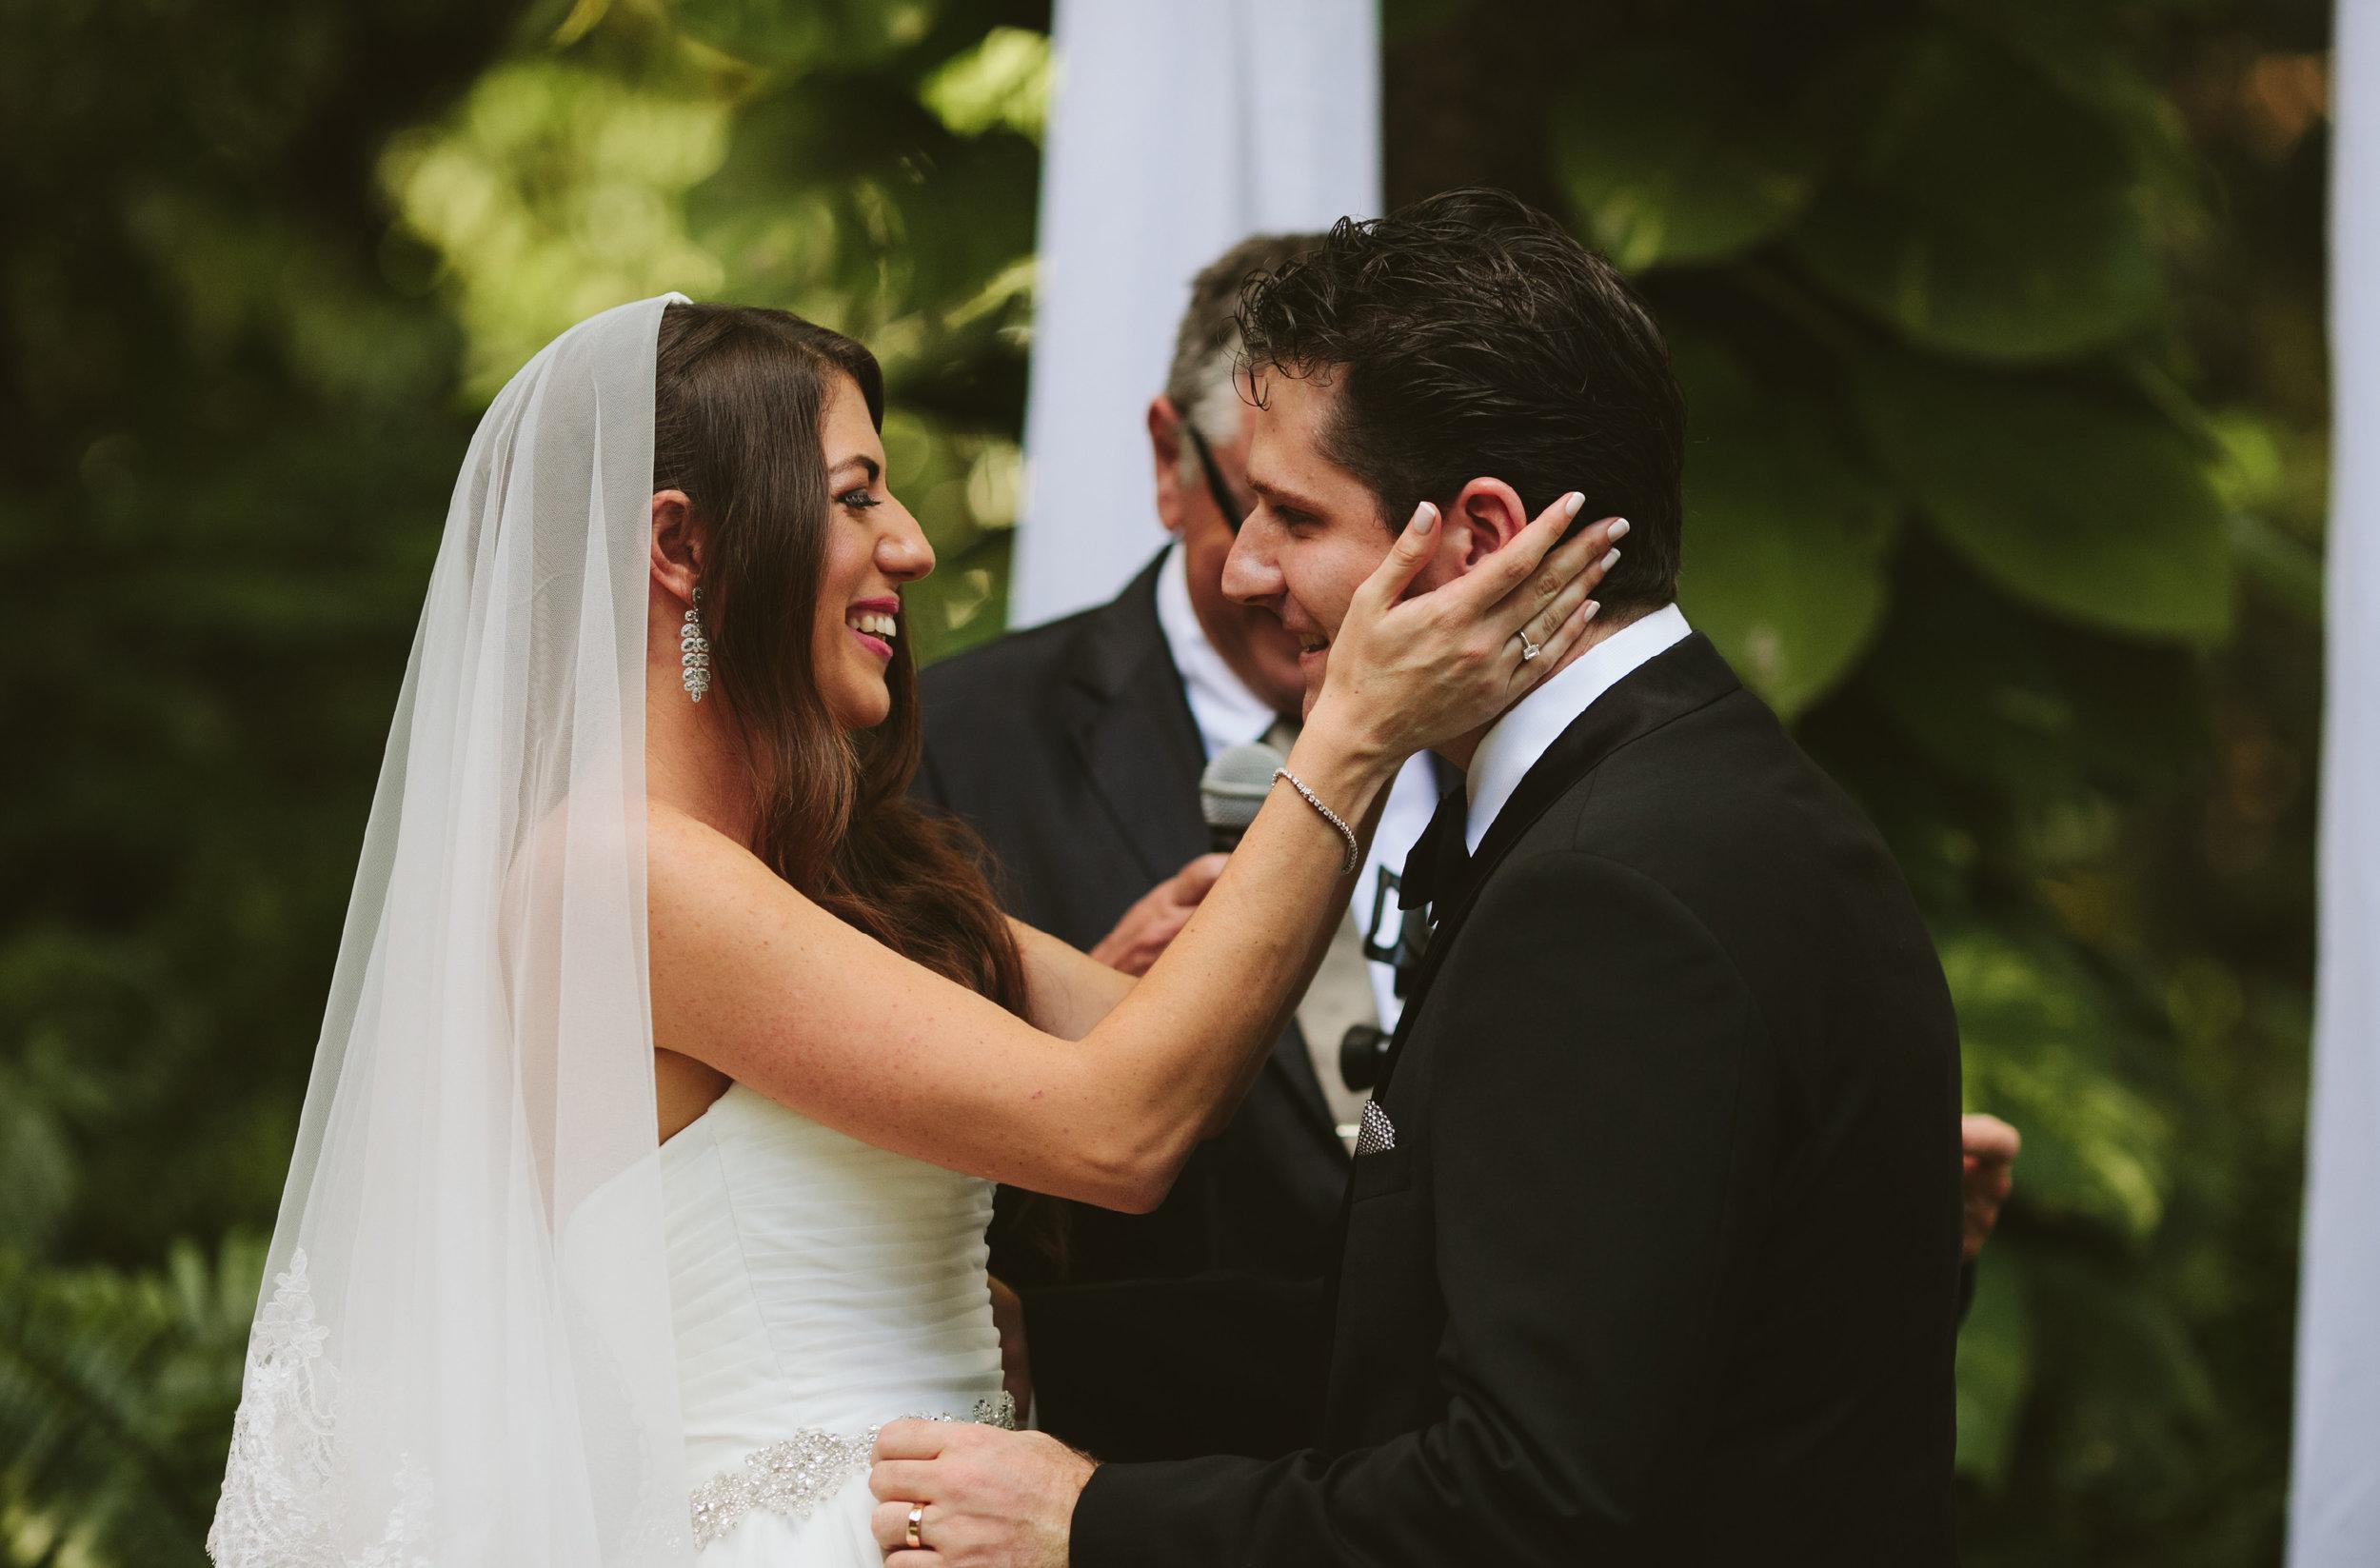 Meli + Mike Coconut Grove Wedding at Villa Woodbine56.jpg